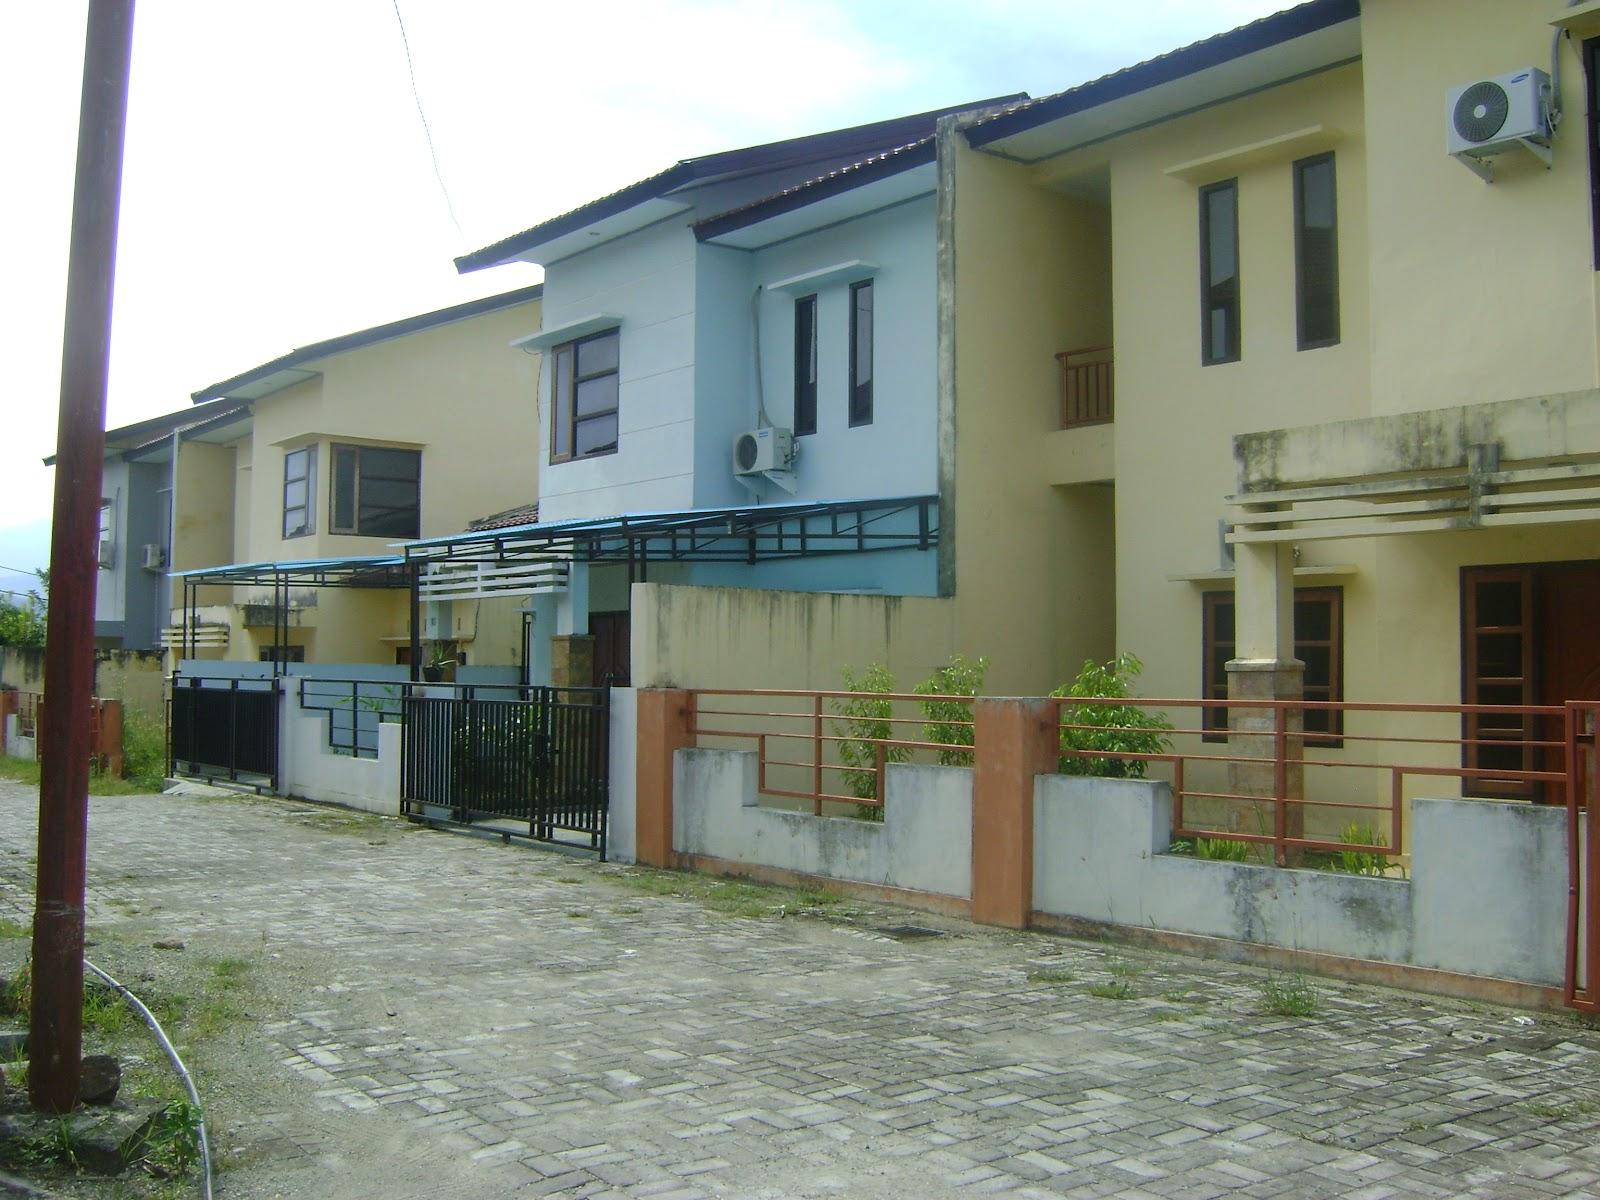 Kawasan perumahan yang baru dibangun di kawasan Abepura.